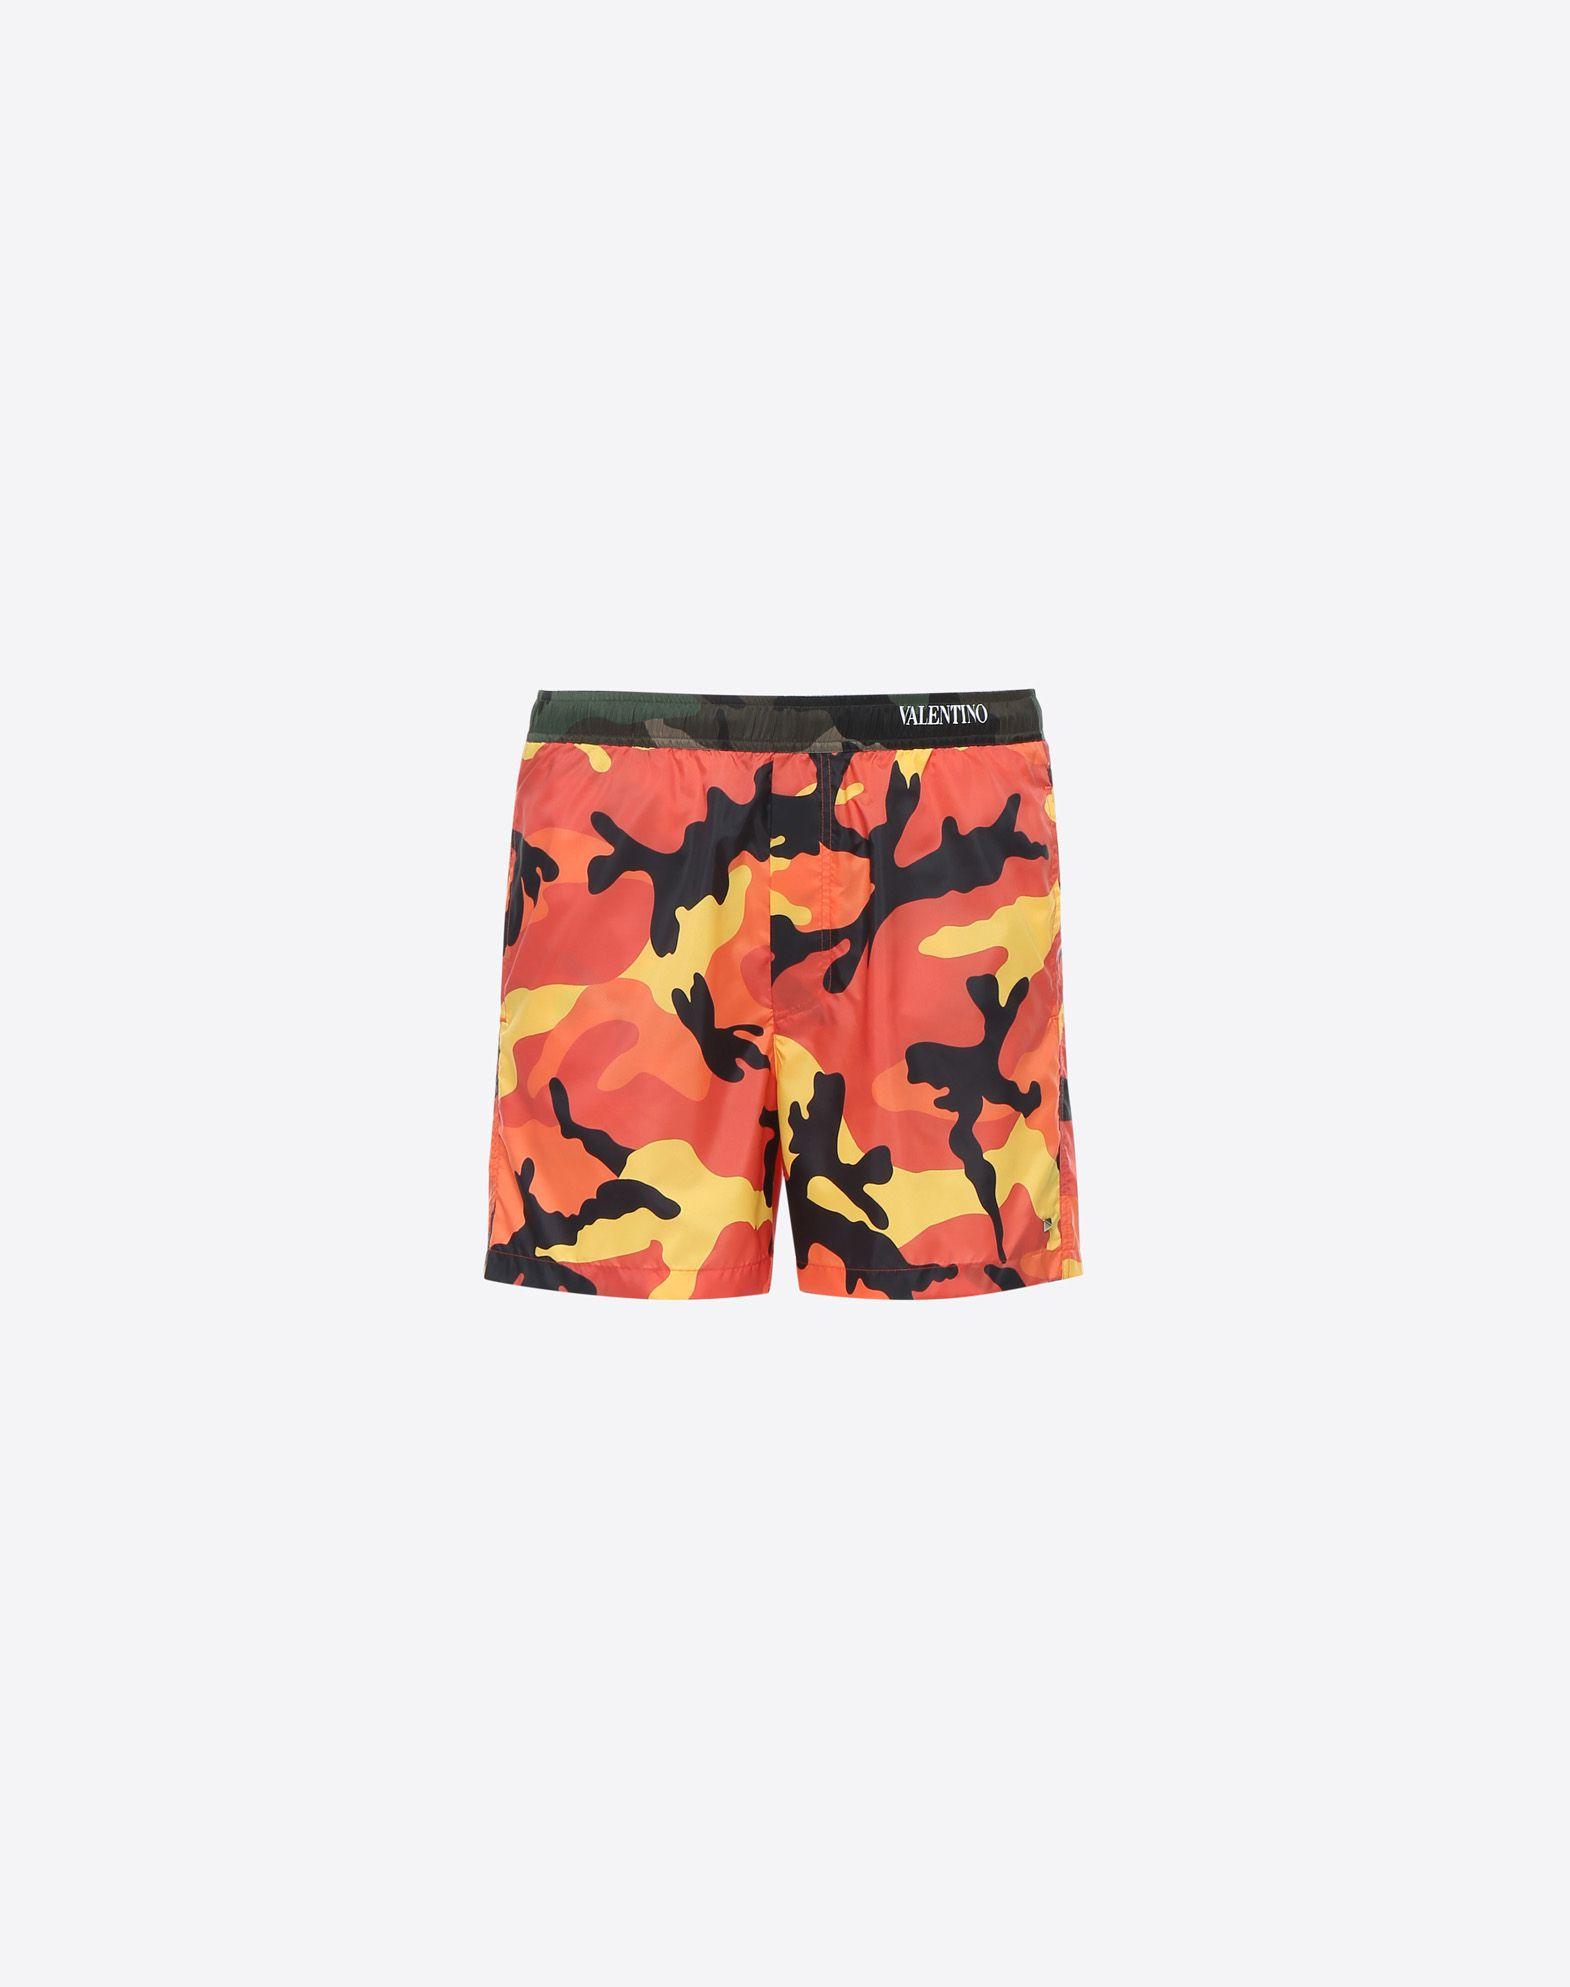 VALENTINO Techno fabric Camouflage Drawstring closure Internal slip Three pockets Logo  47224915tb